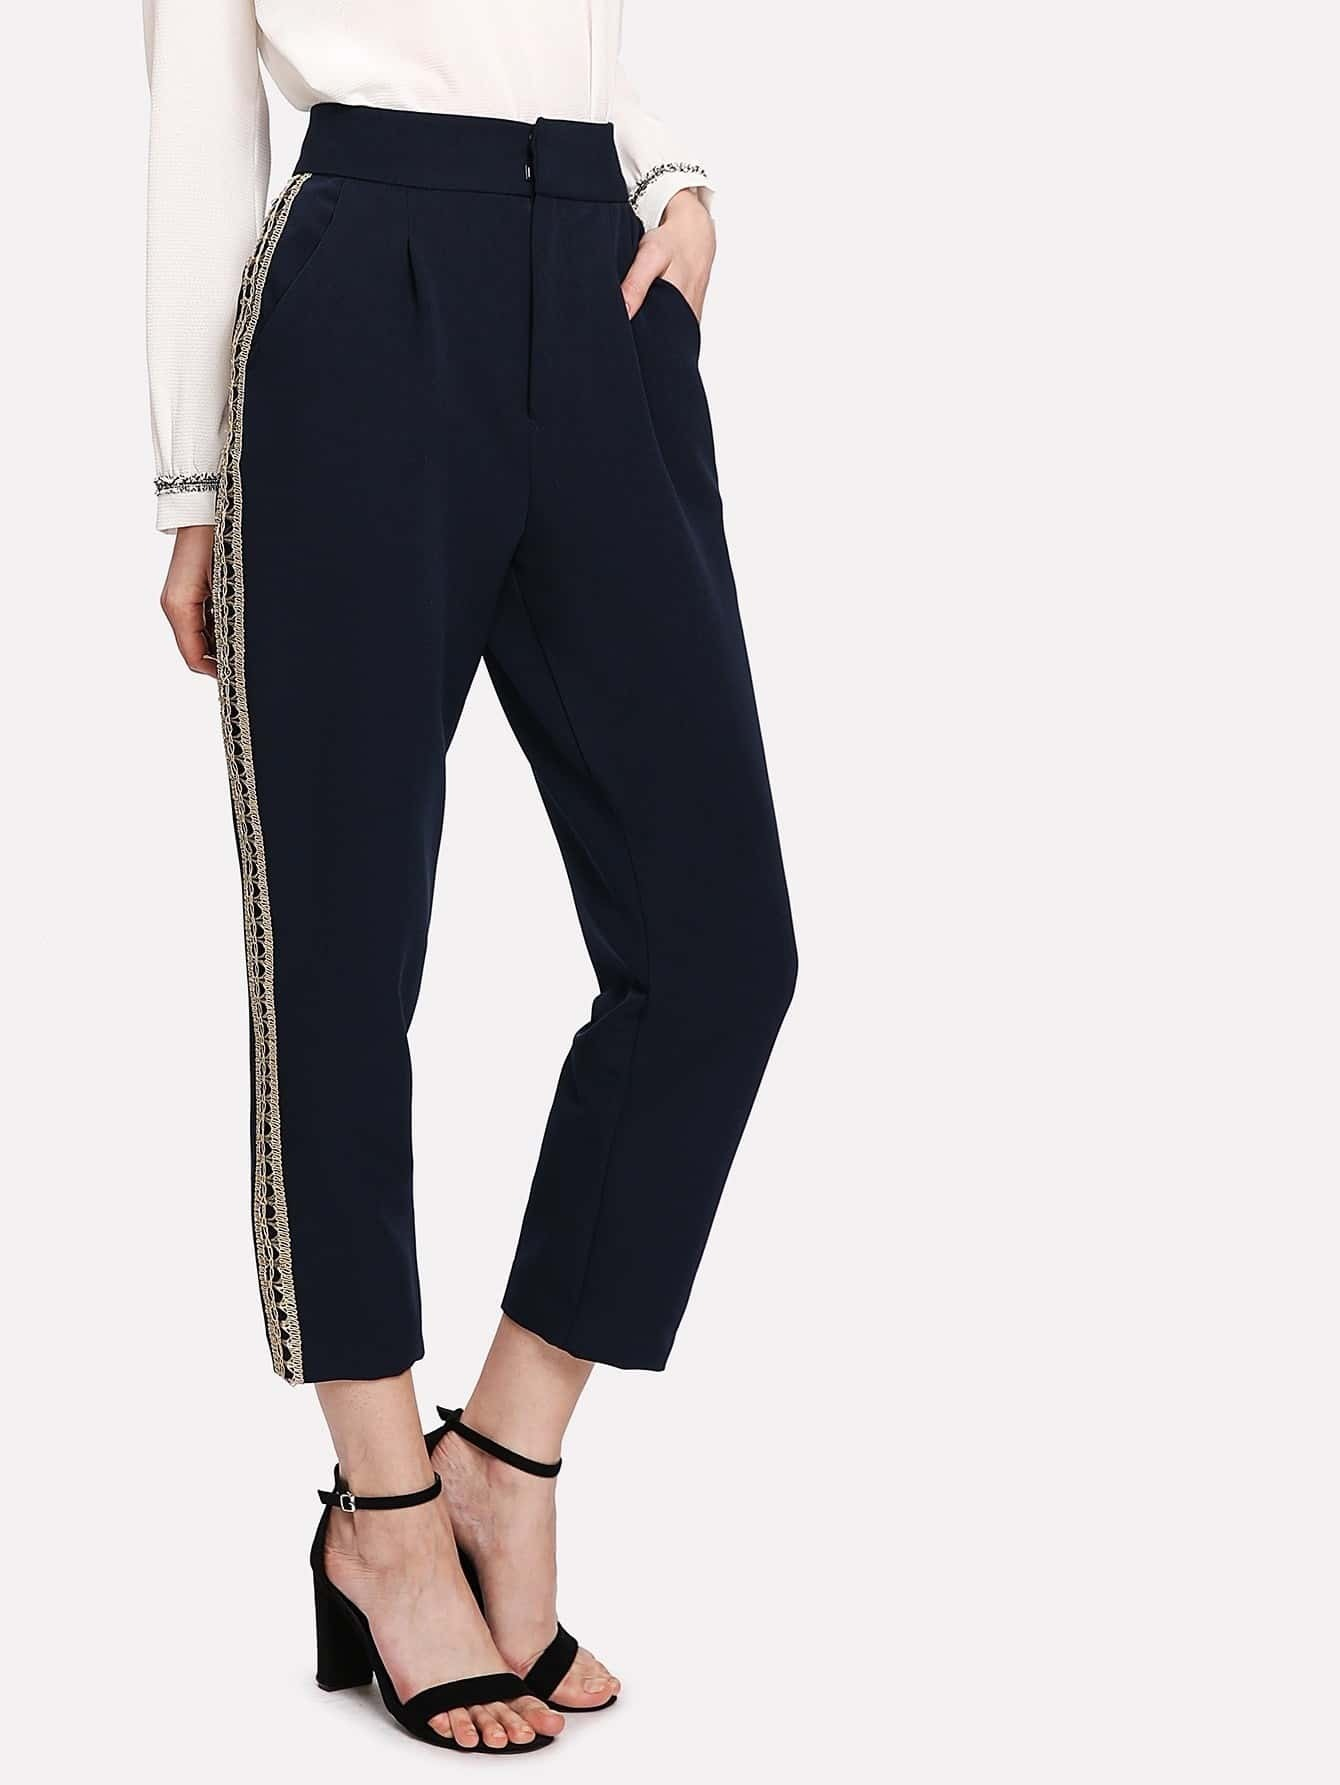 Image of Crochet Tape High Waist Crop Pants